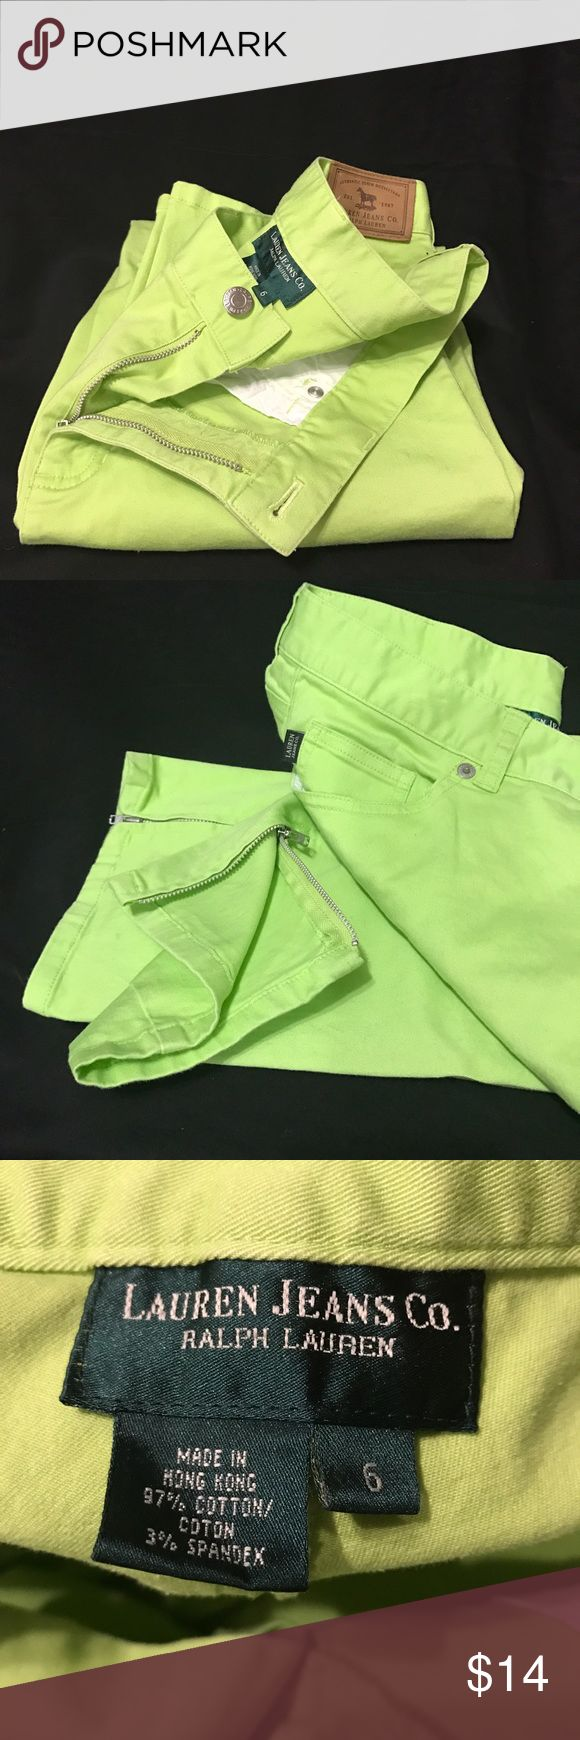 Ralph Lauren Lime Green Pants Size 6 Lime Green Crop pants with zipper leg Lauren Jeans Company Ralph Lauren  Pants Capris